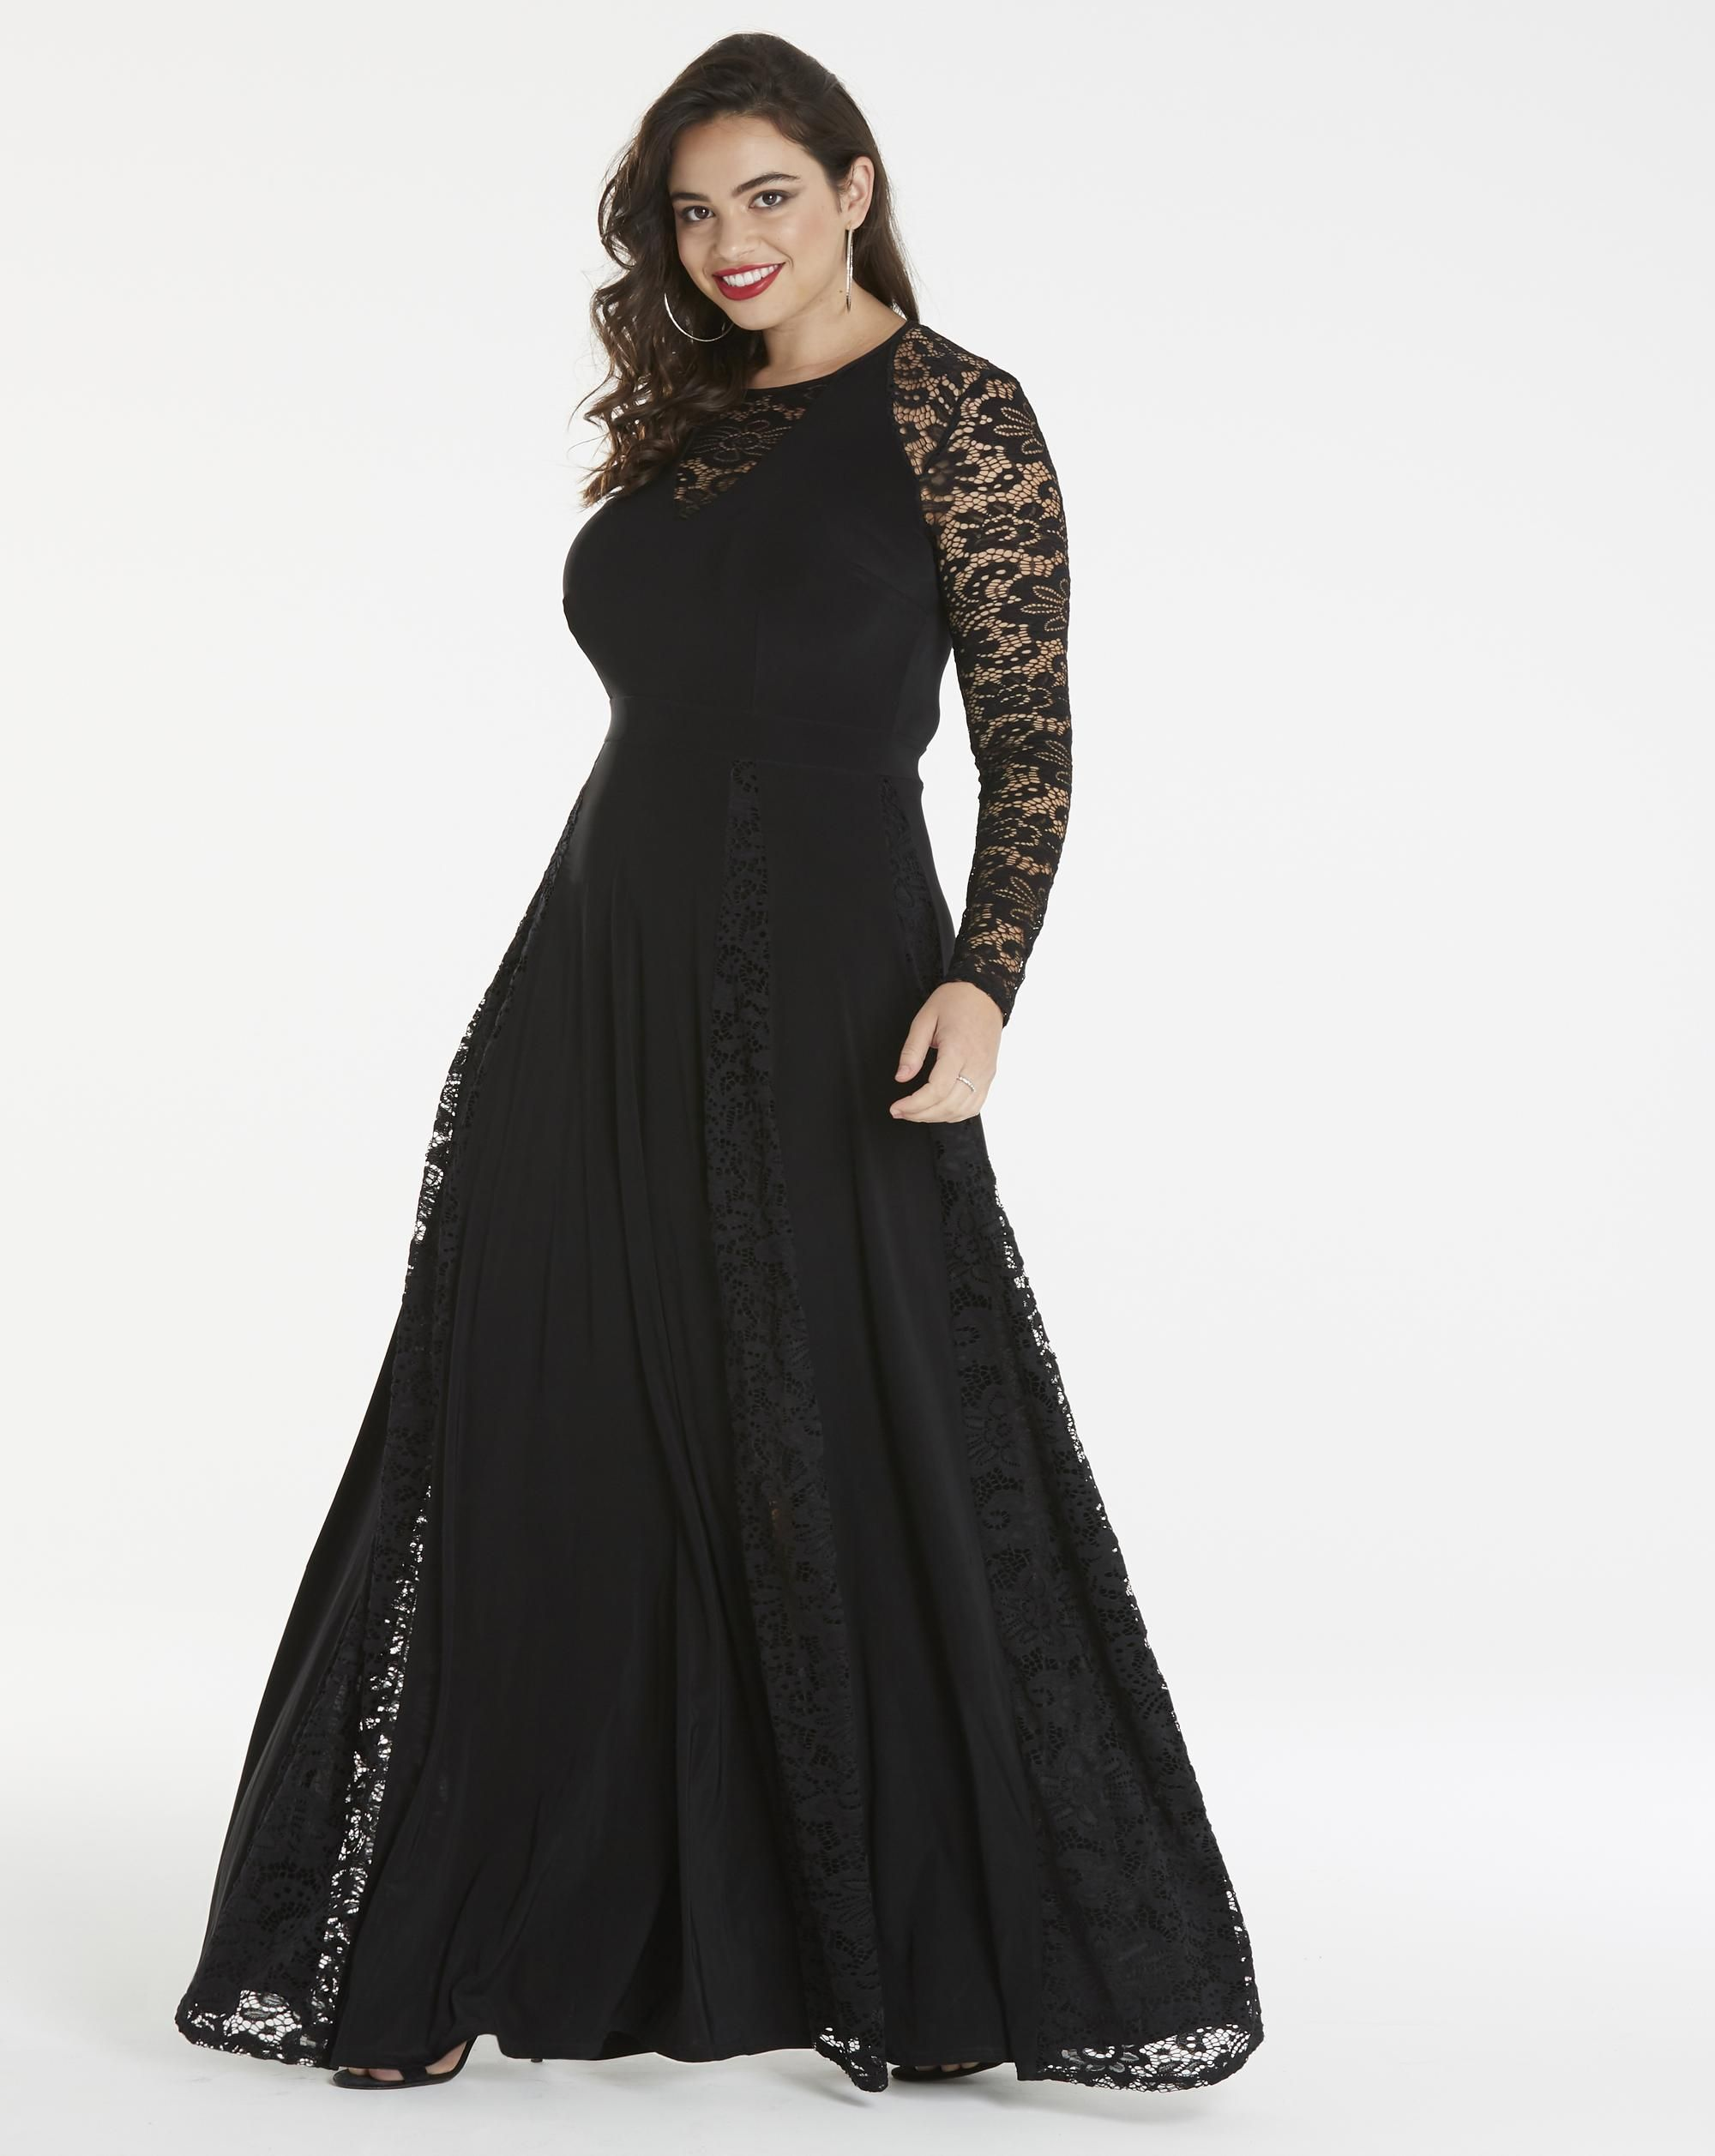 Trendy Plus Size Evening Dresses